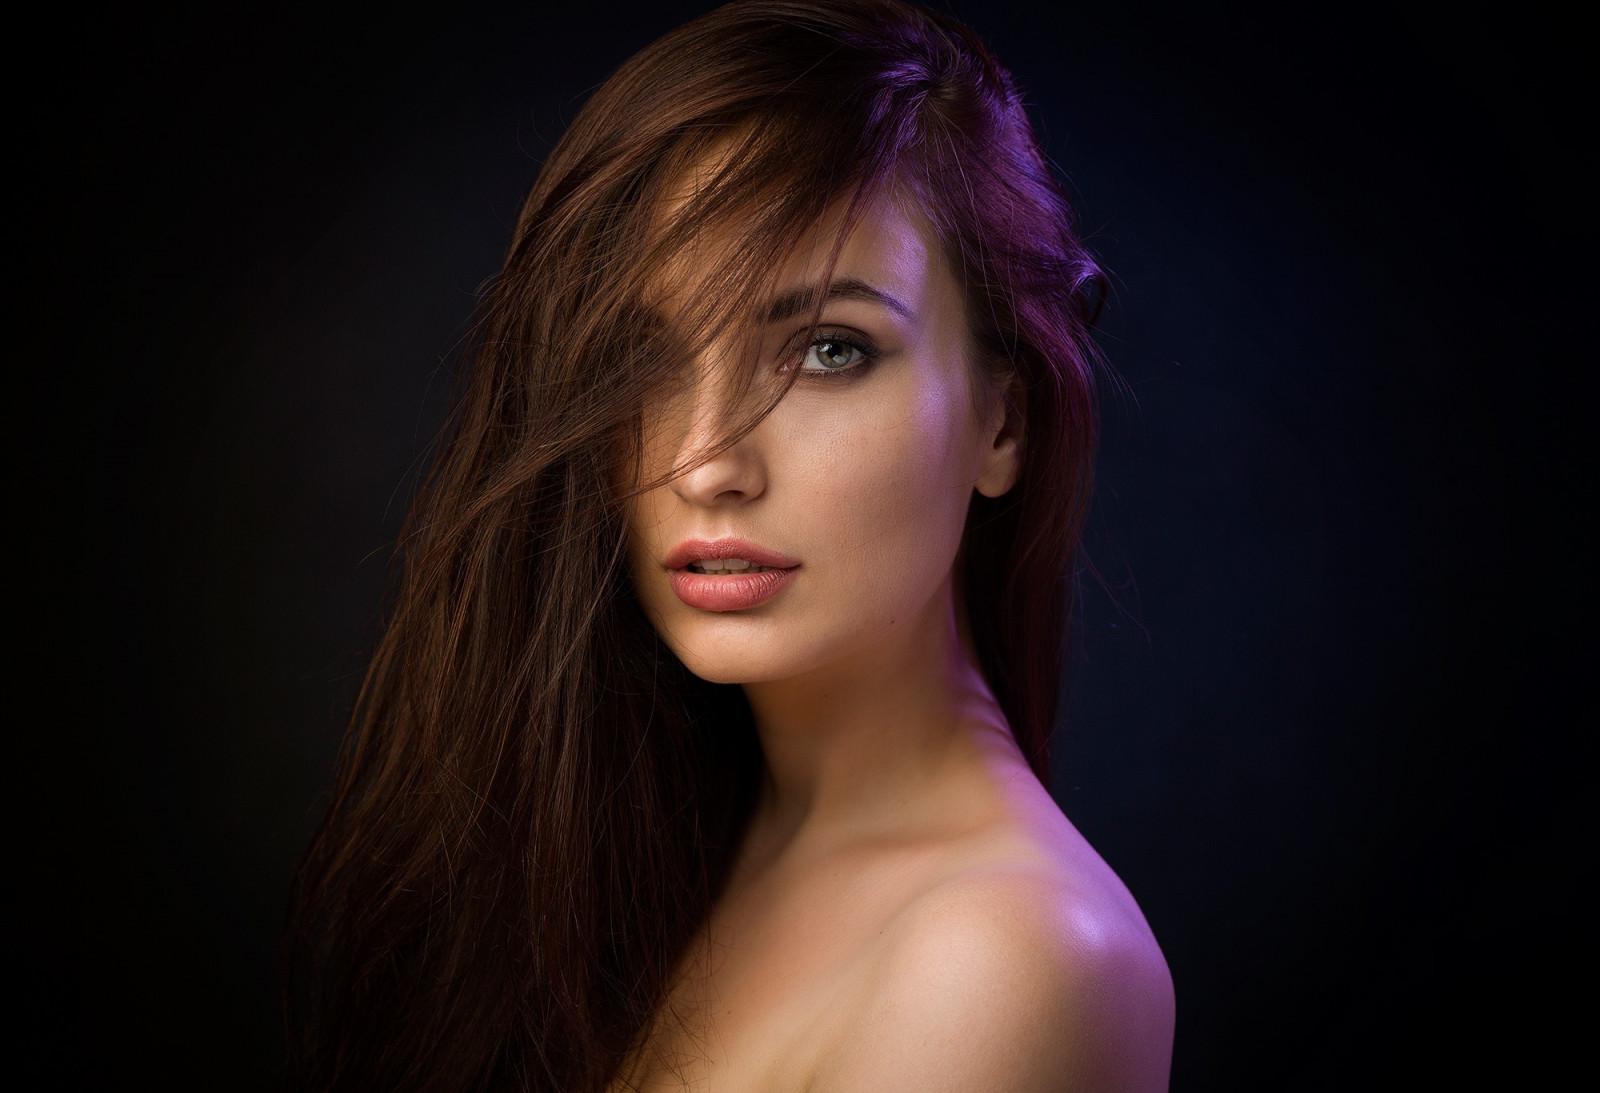 Wallpaper : face, women, simple background, long hair